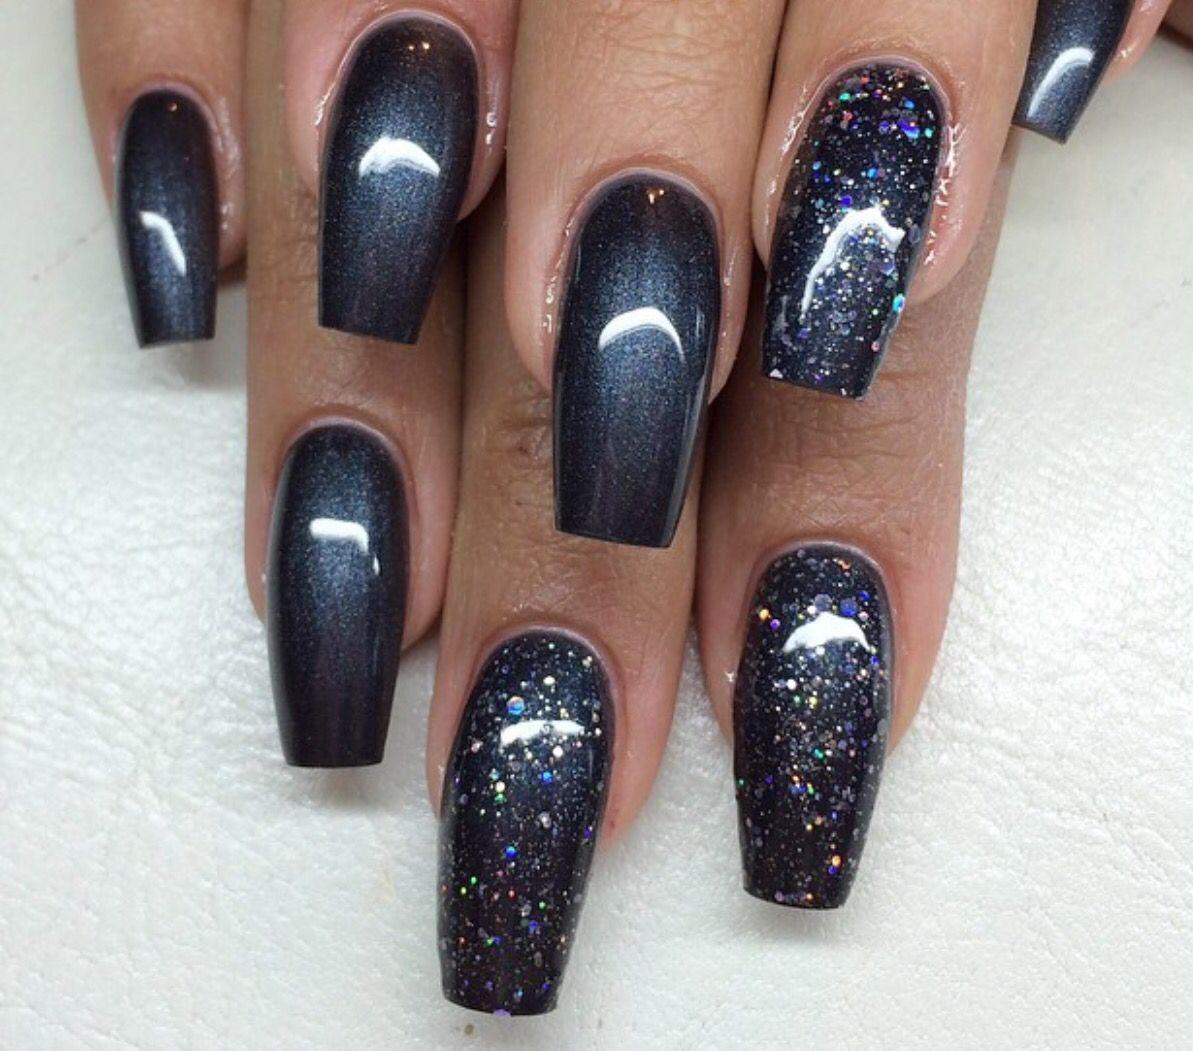 Pin By Jitka Rapantova On Nail Magic With A Little Swag Younique Independent Presenter Grey Nail Designs Gray Nails Dark Grey Nails